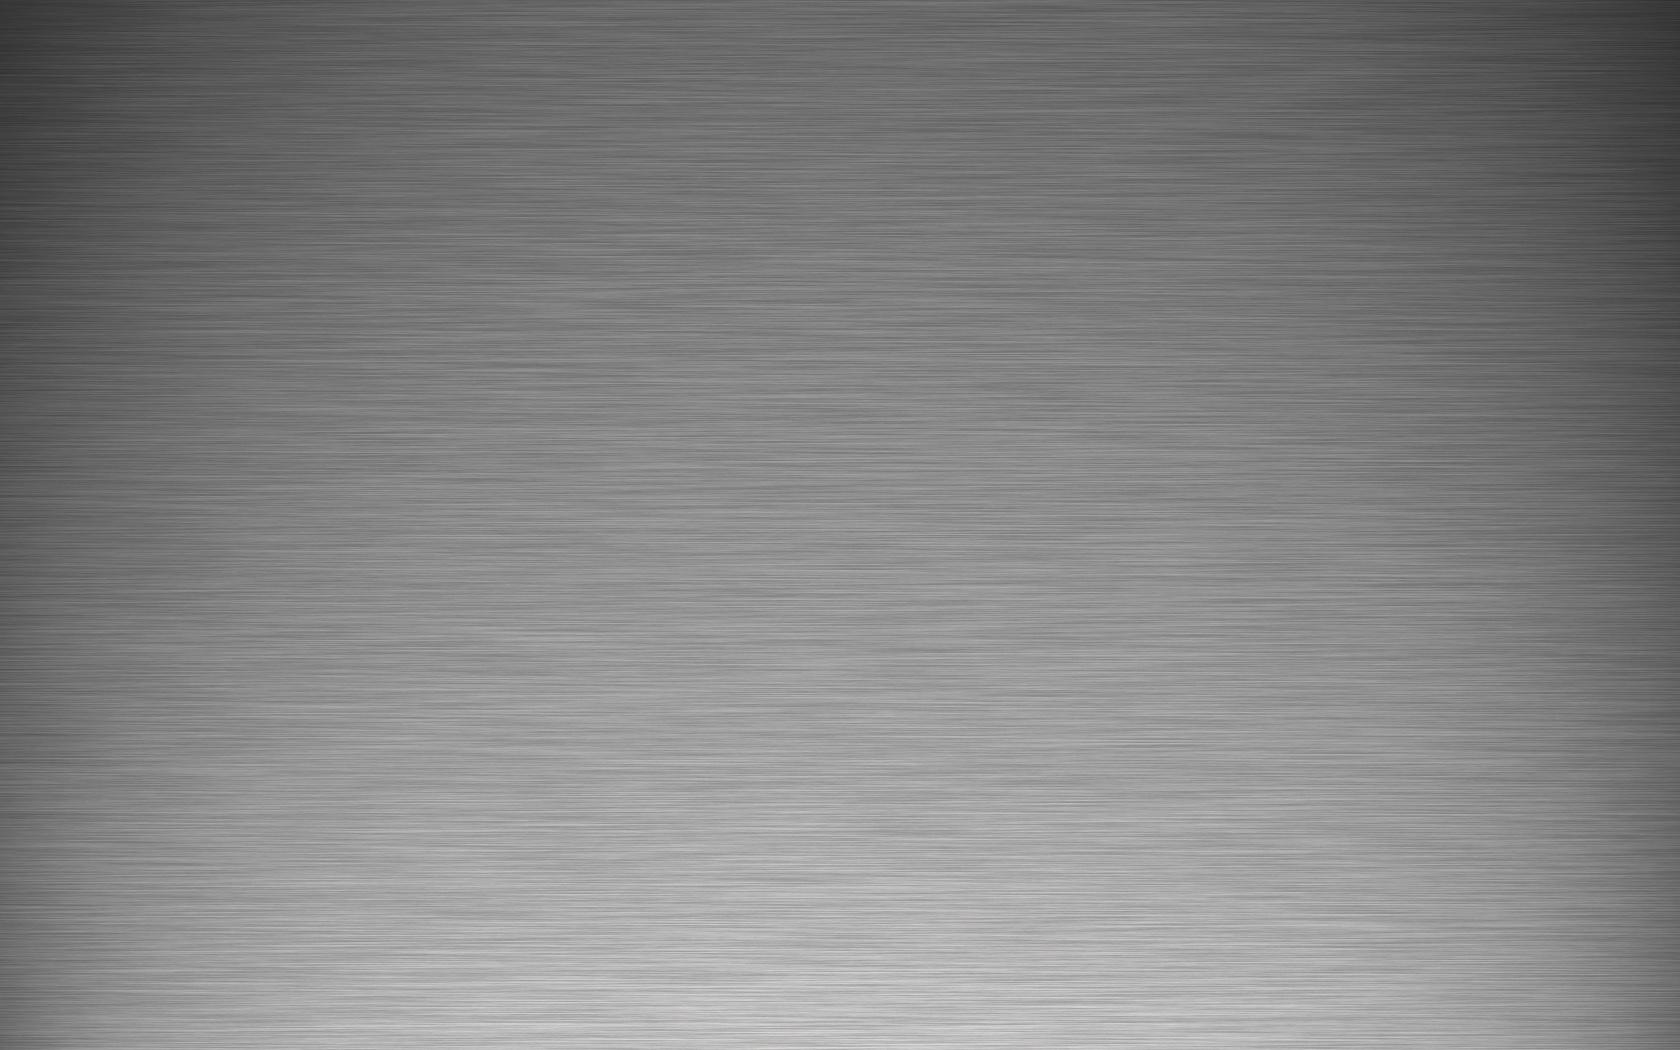 ... Aluminum the great by TheFuelofInspiration on DeviantArt ...